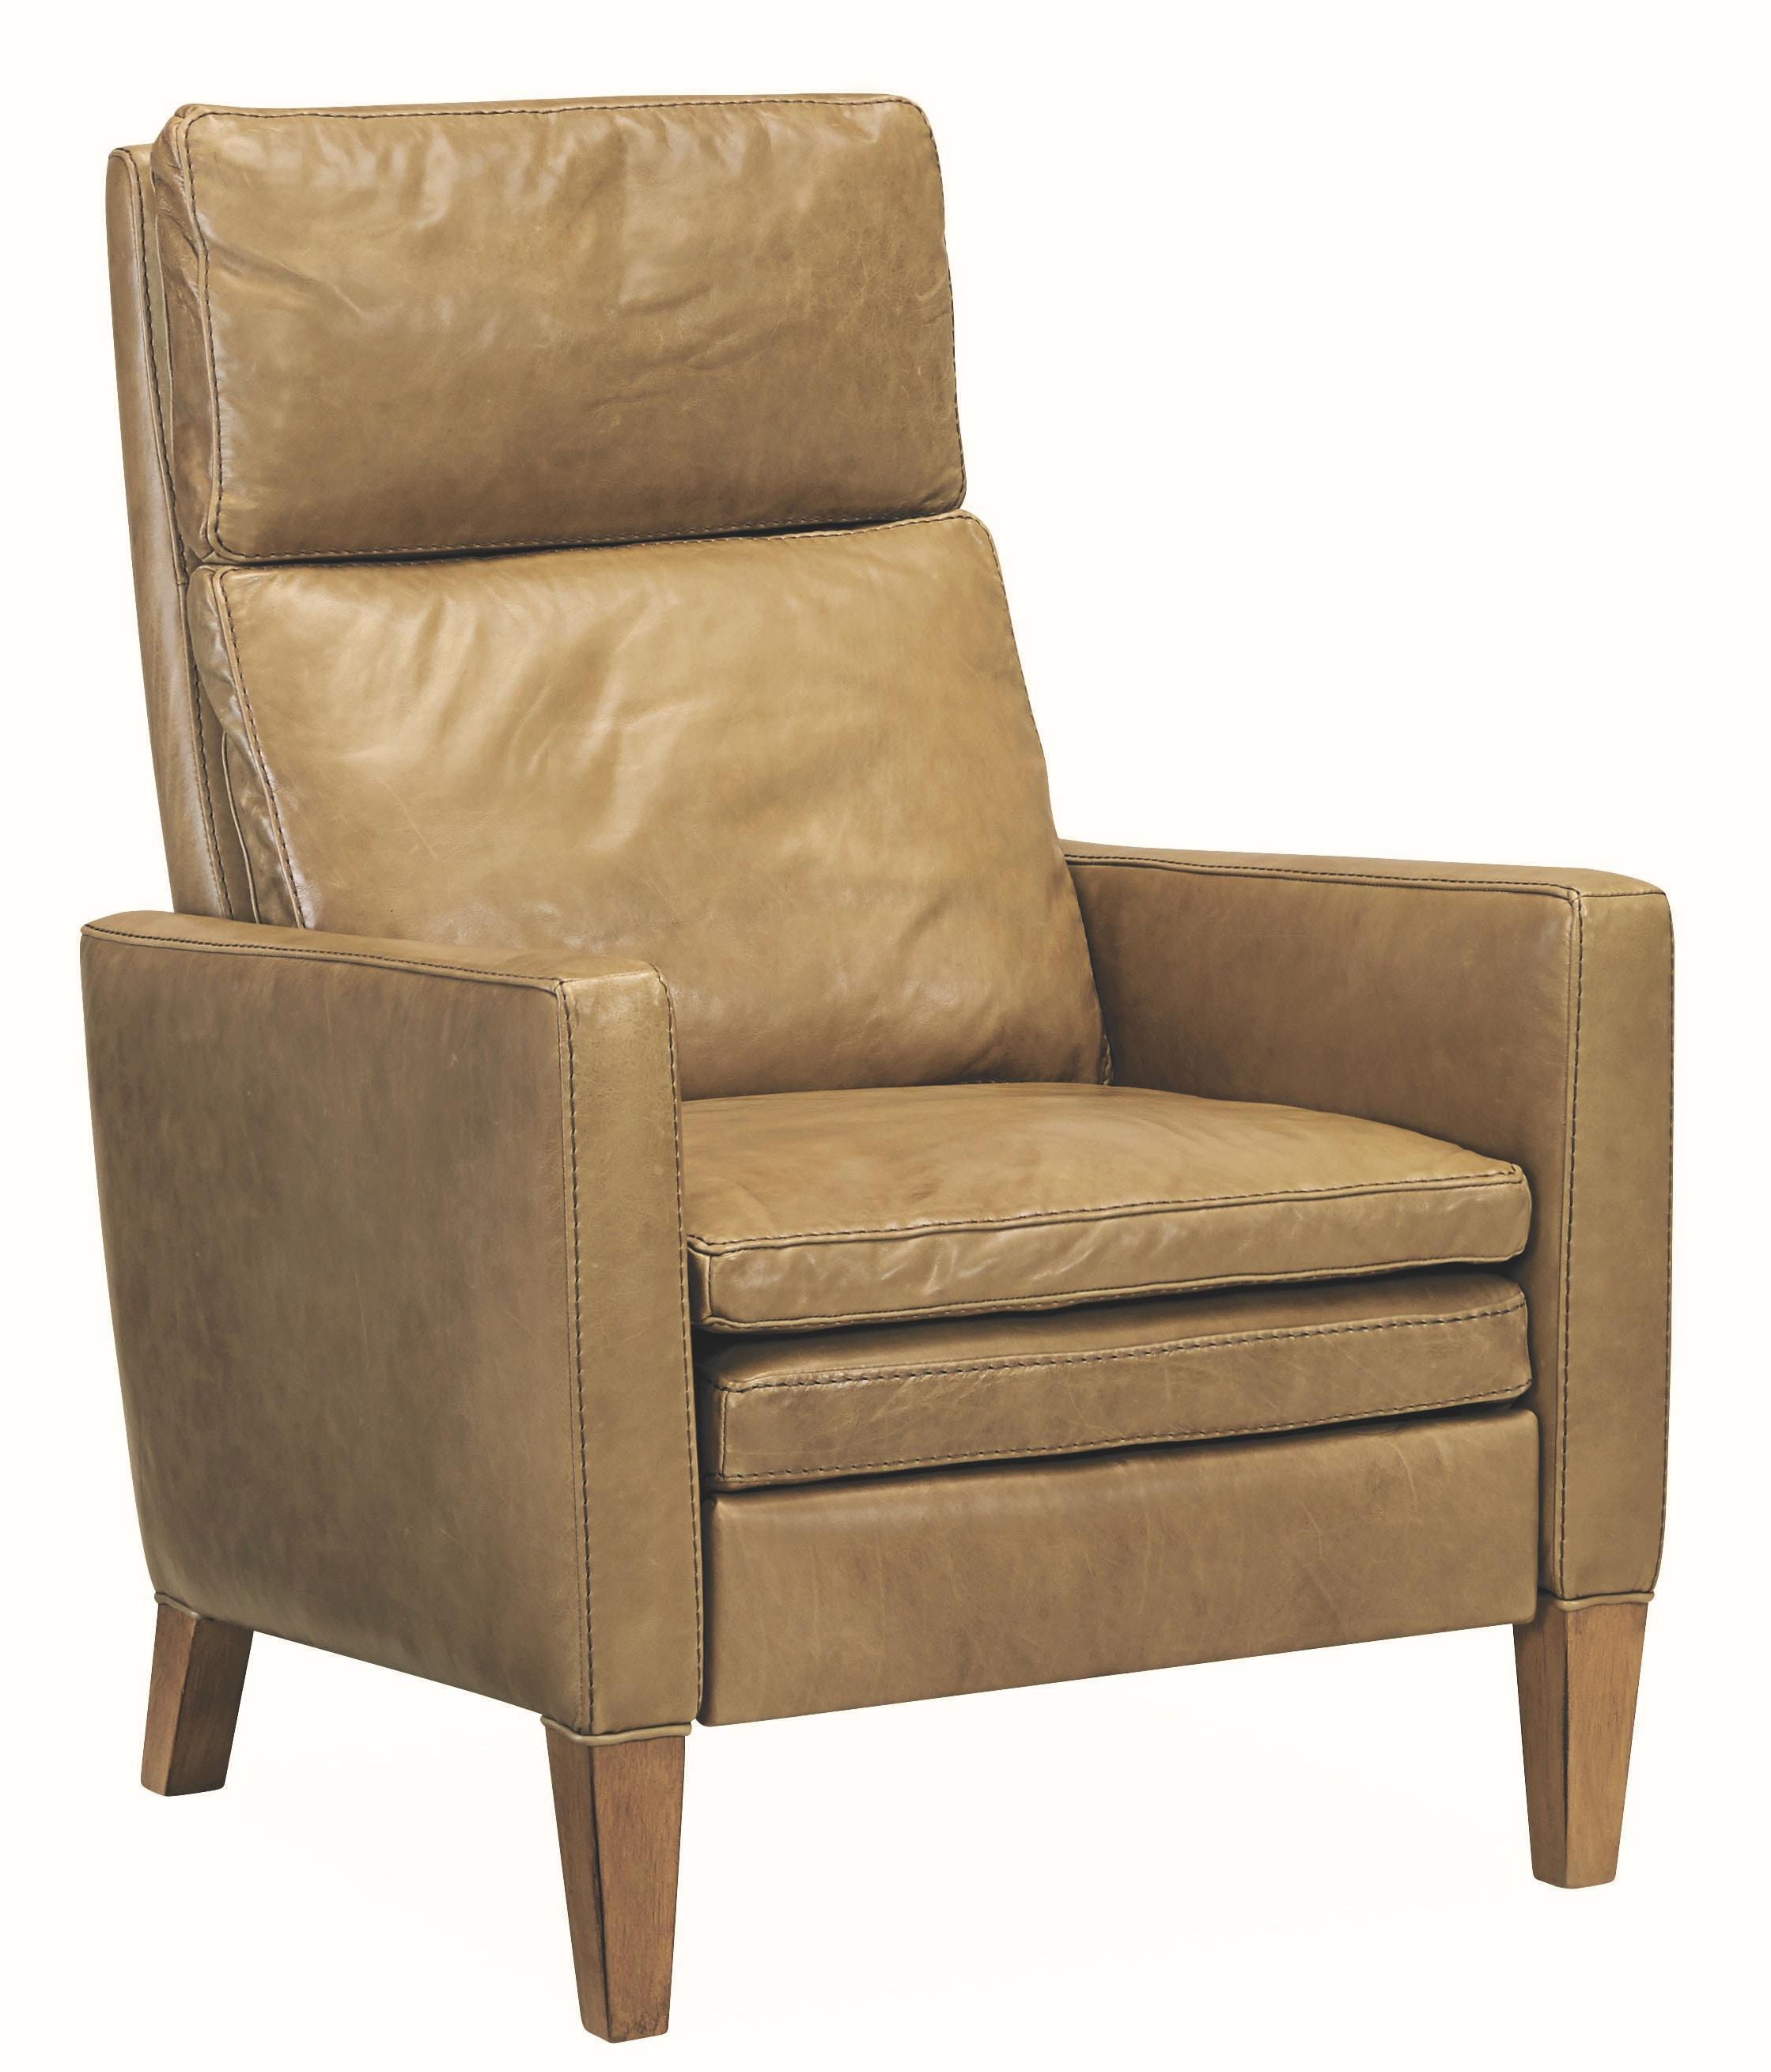 atlanta recliner chair lounge towel lee industries living room relaxor 1274 01r r w design at exchange